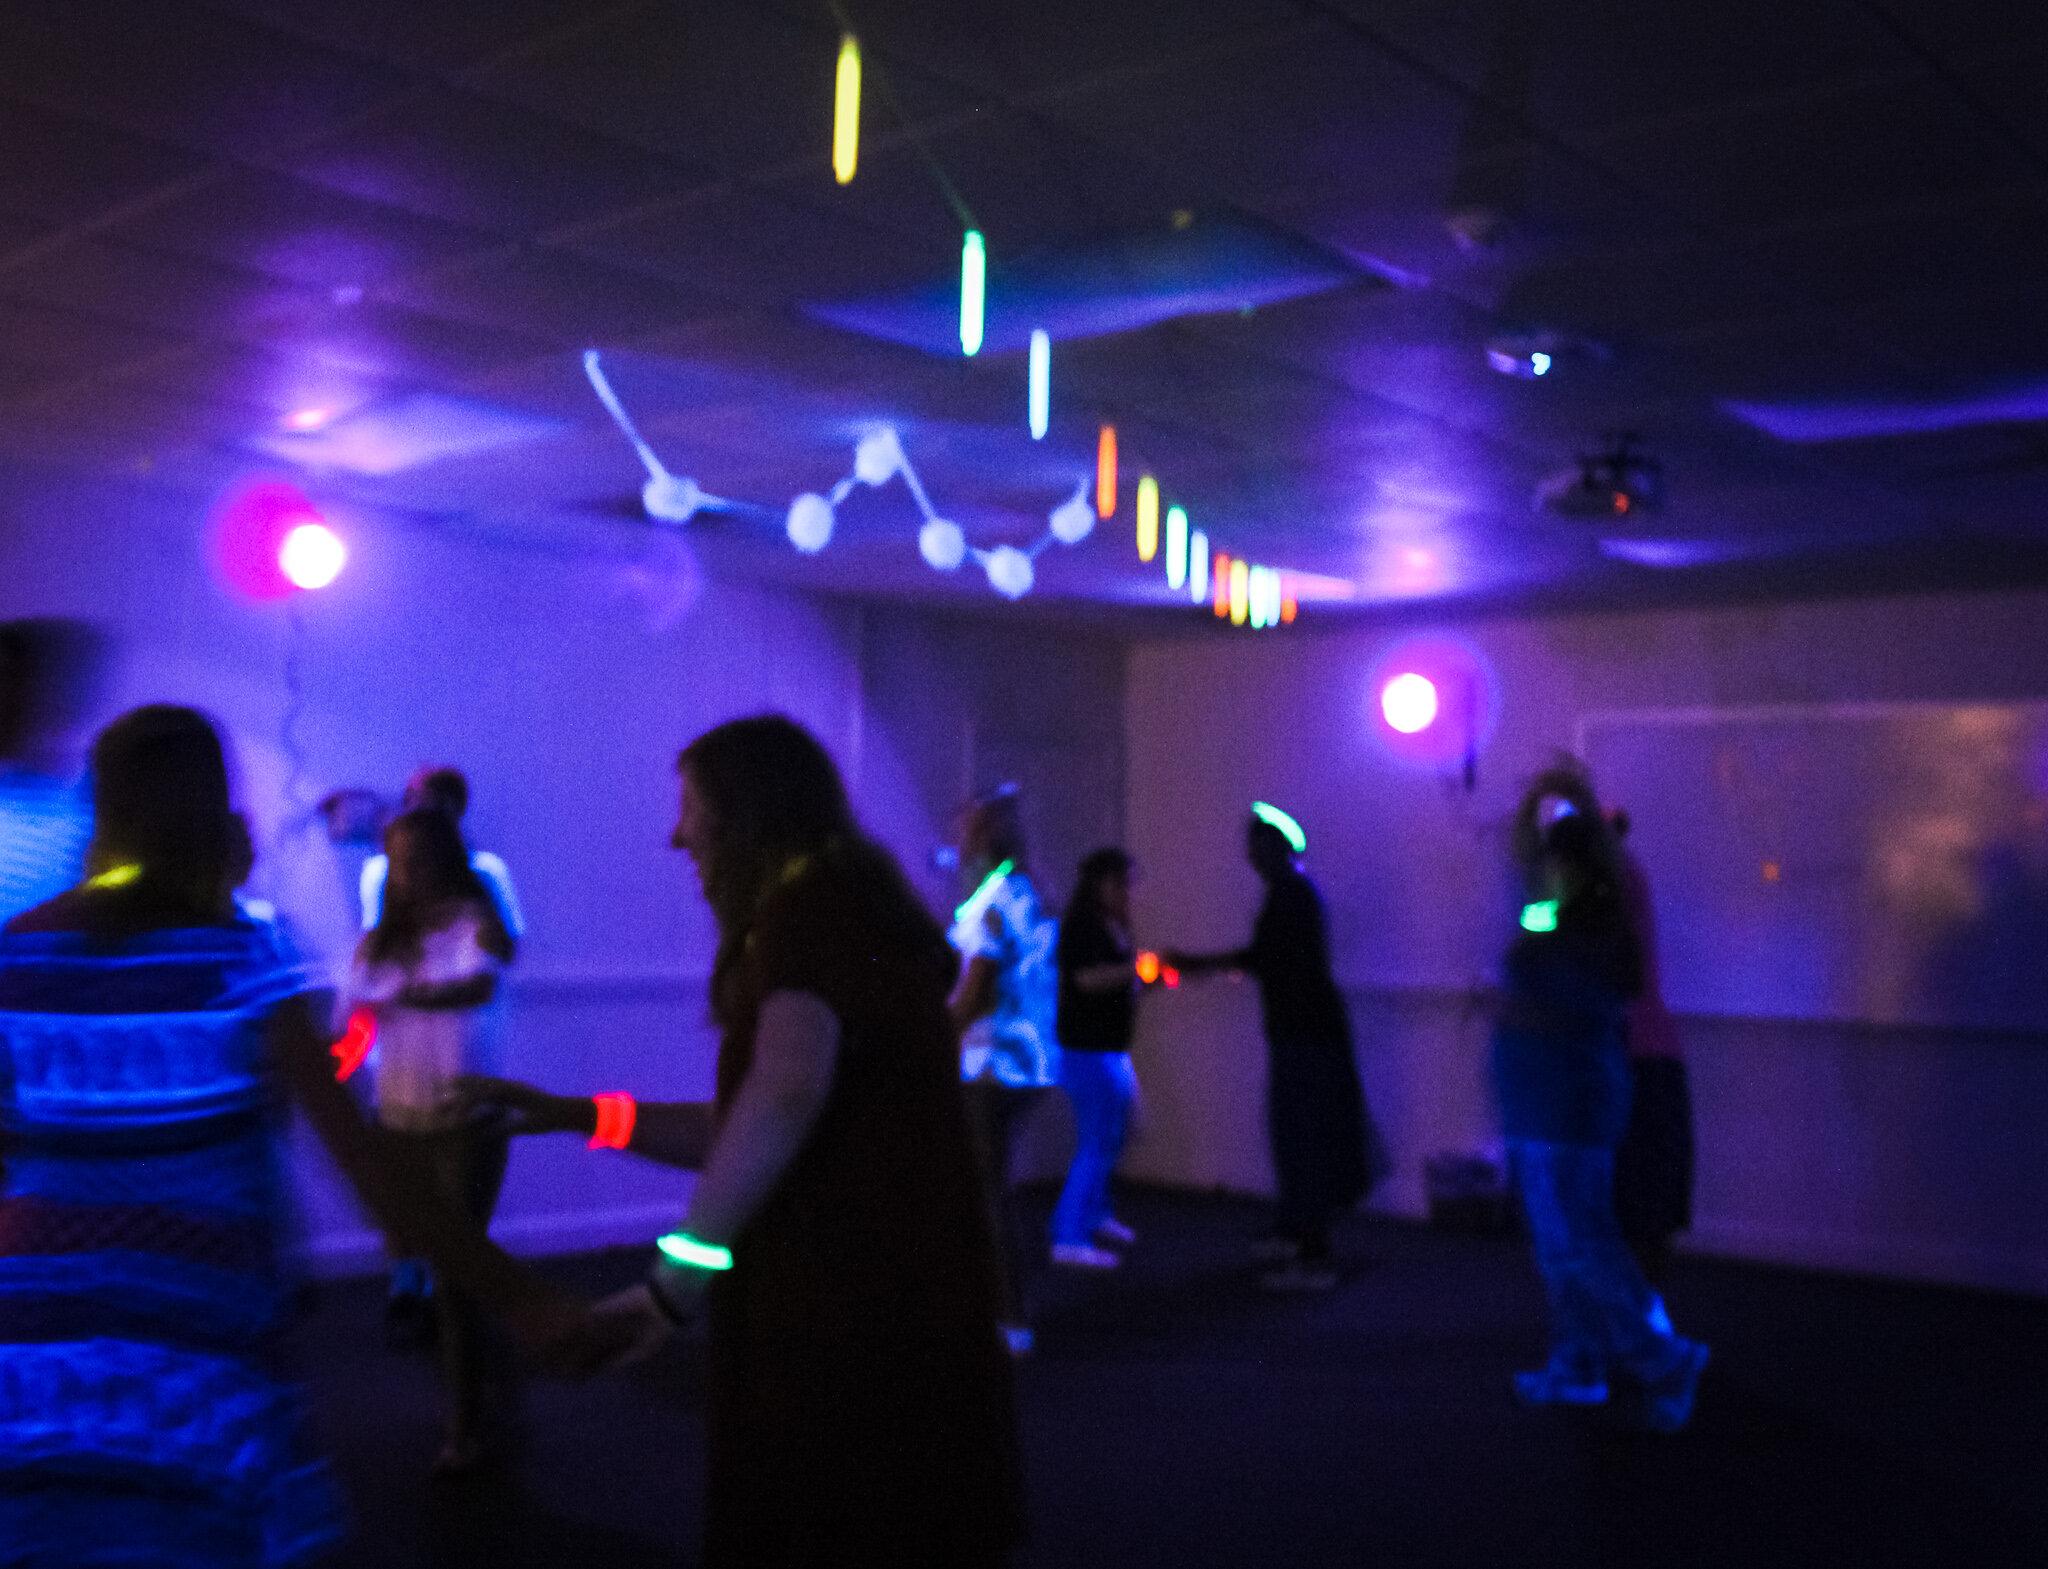 Swing dance club members dancing at the glow party.